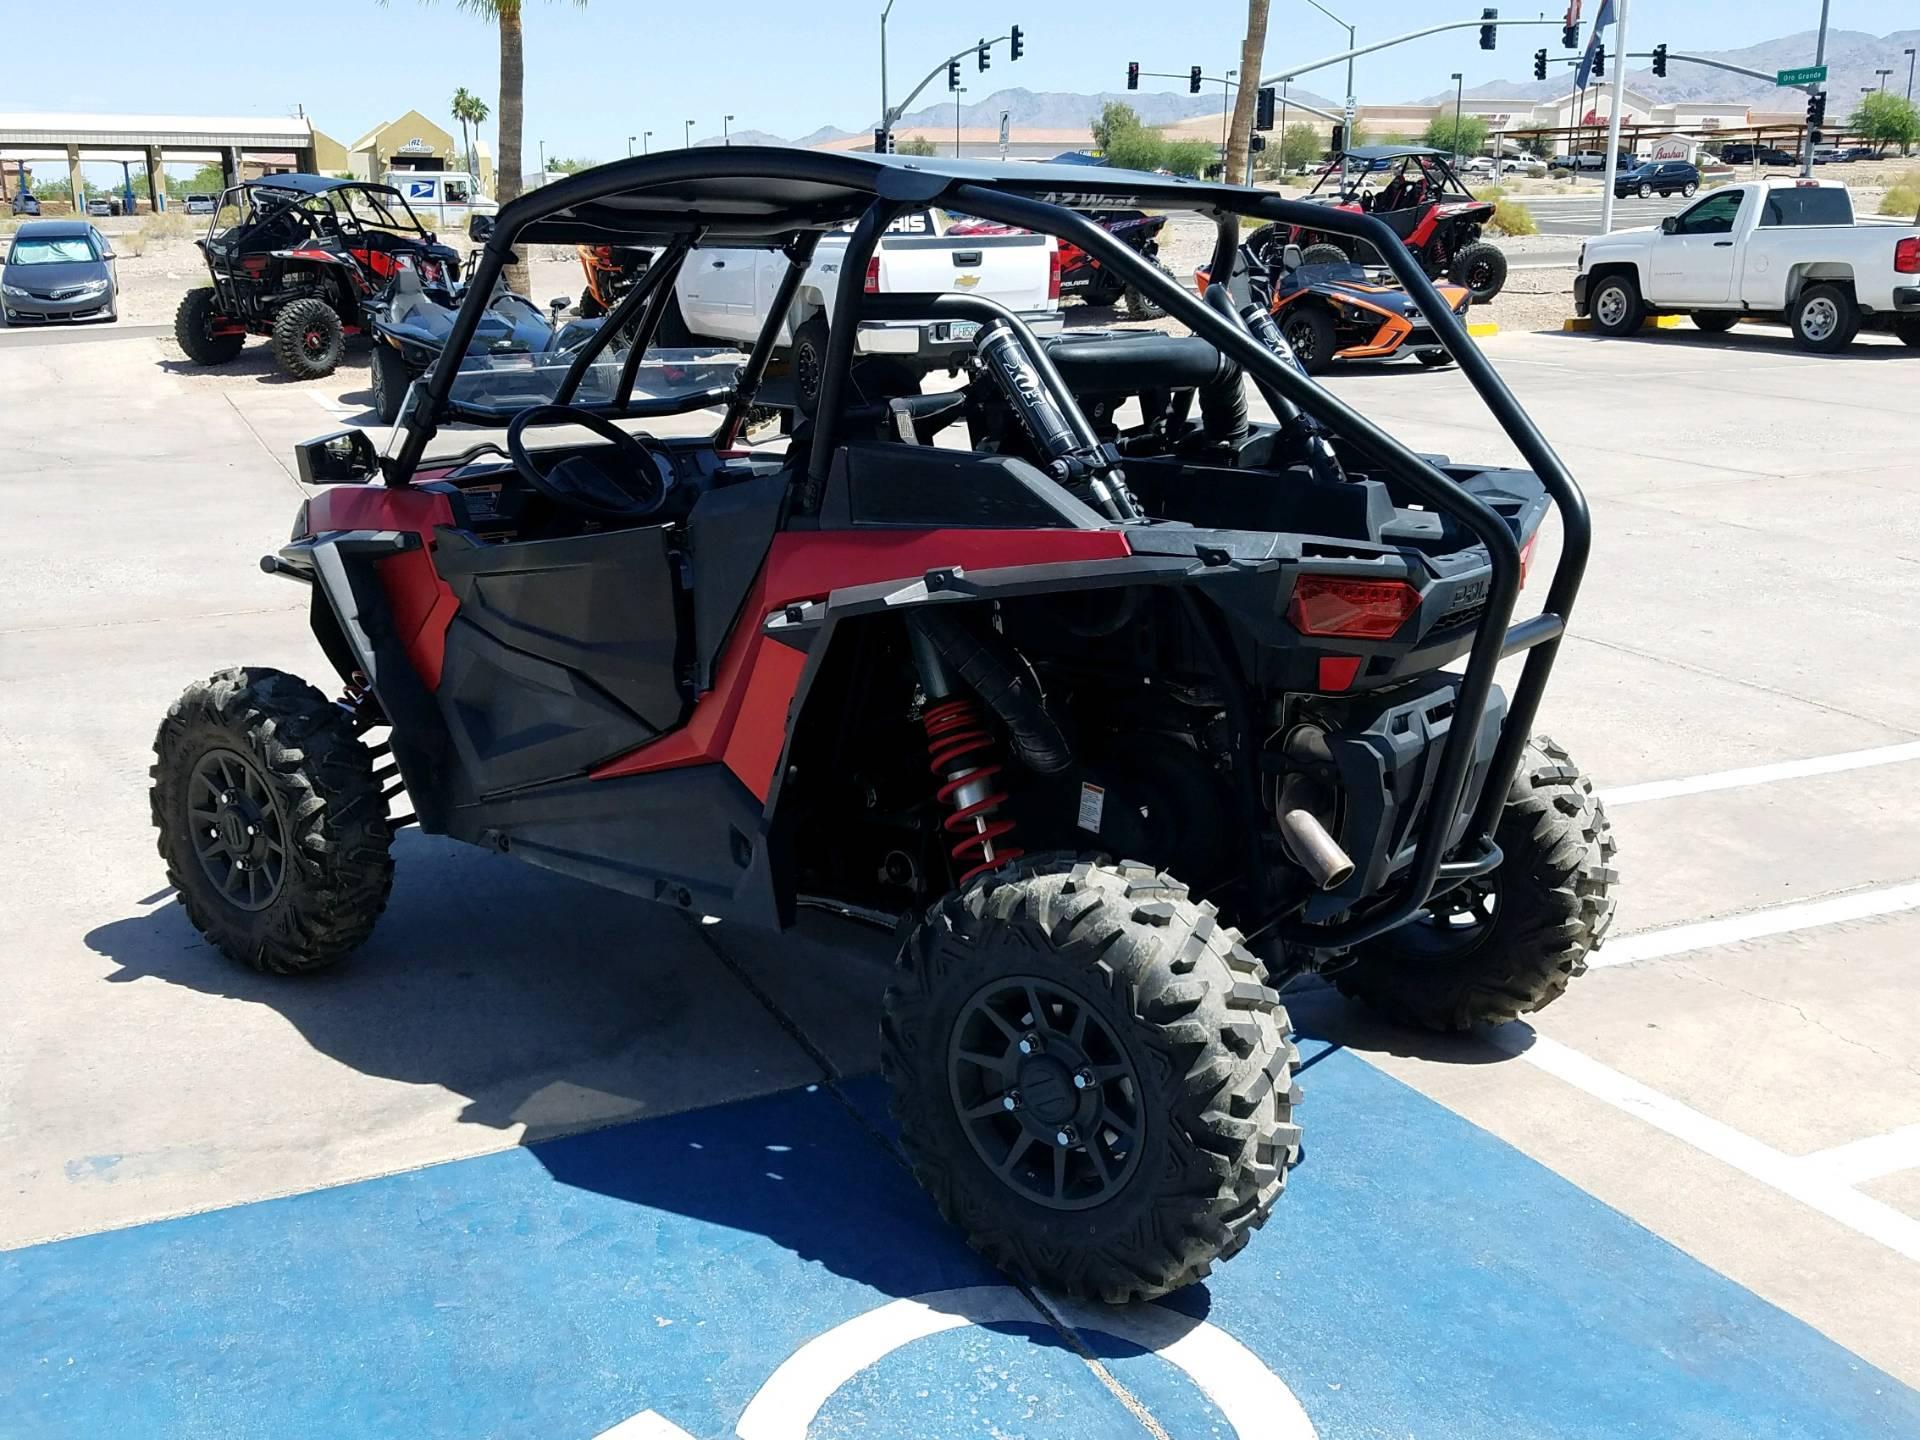 2016 Polaris Rzr Xp Turbo Eps In Lake Havasu City Arizona